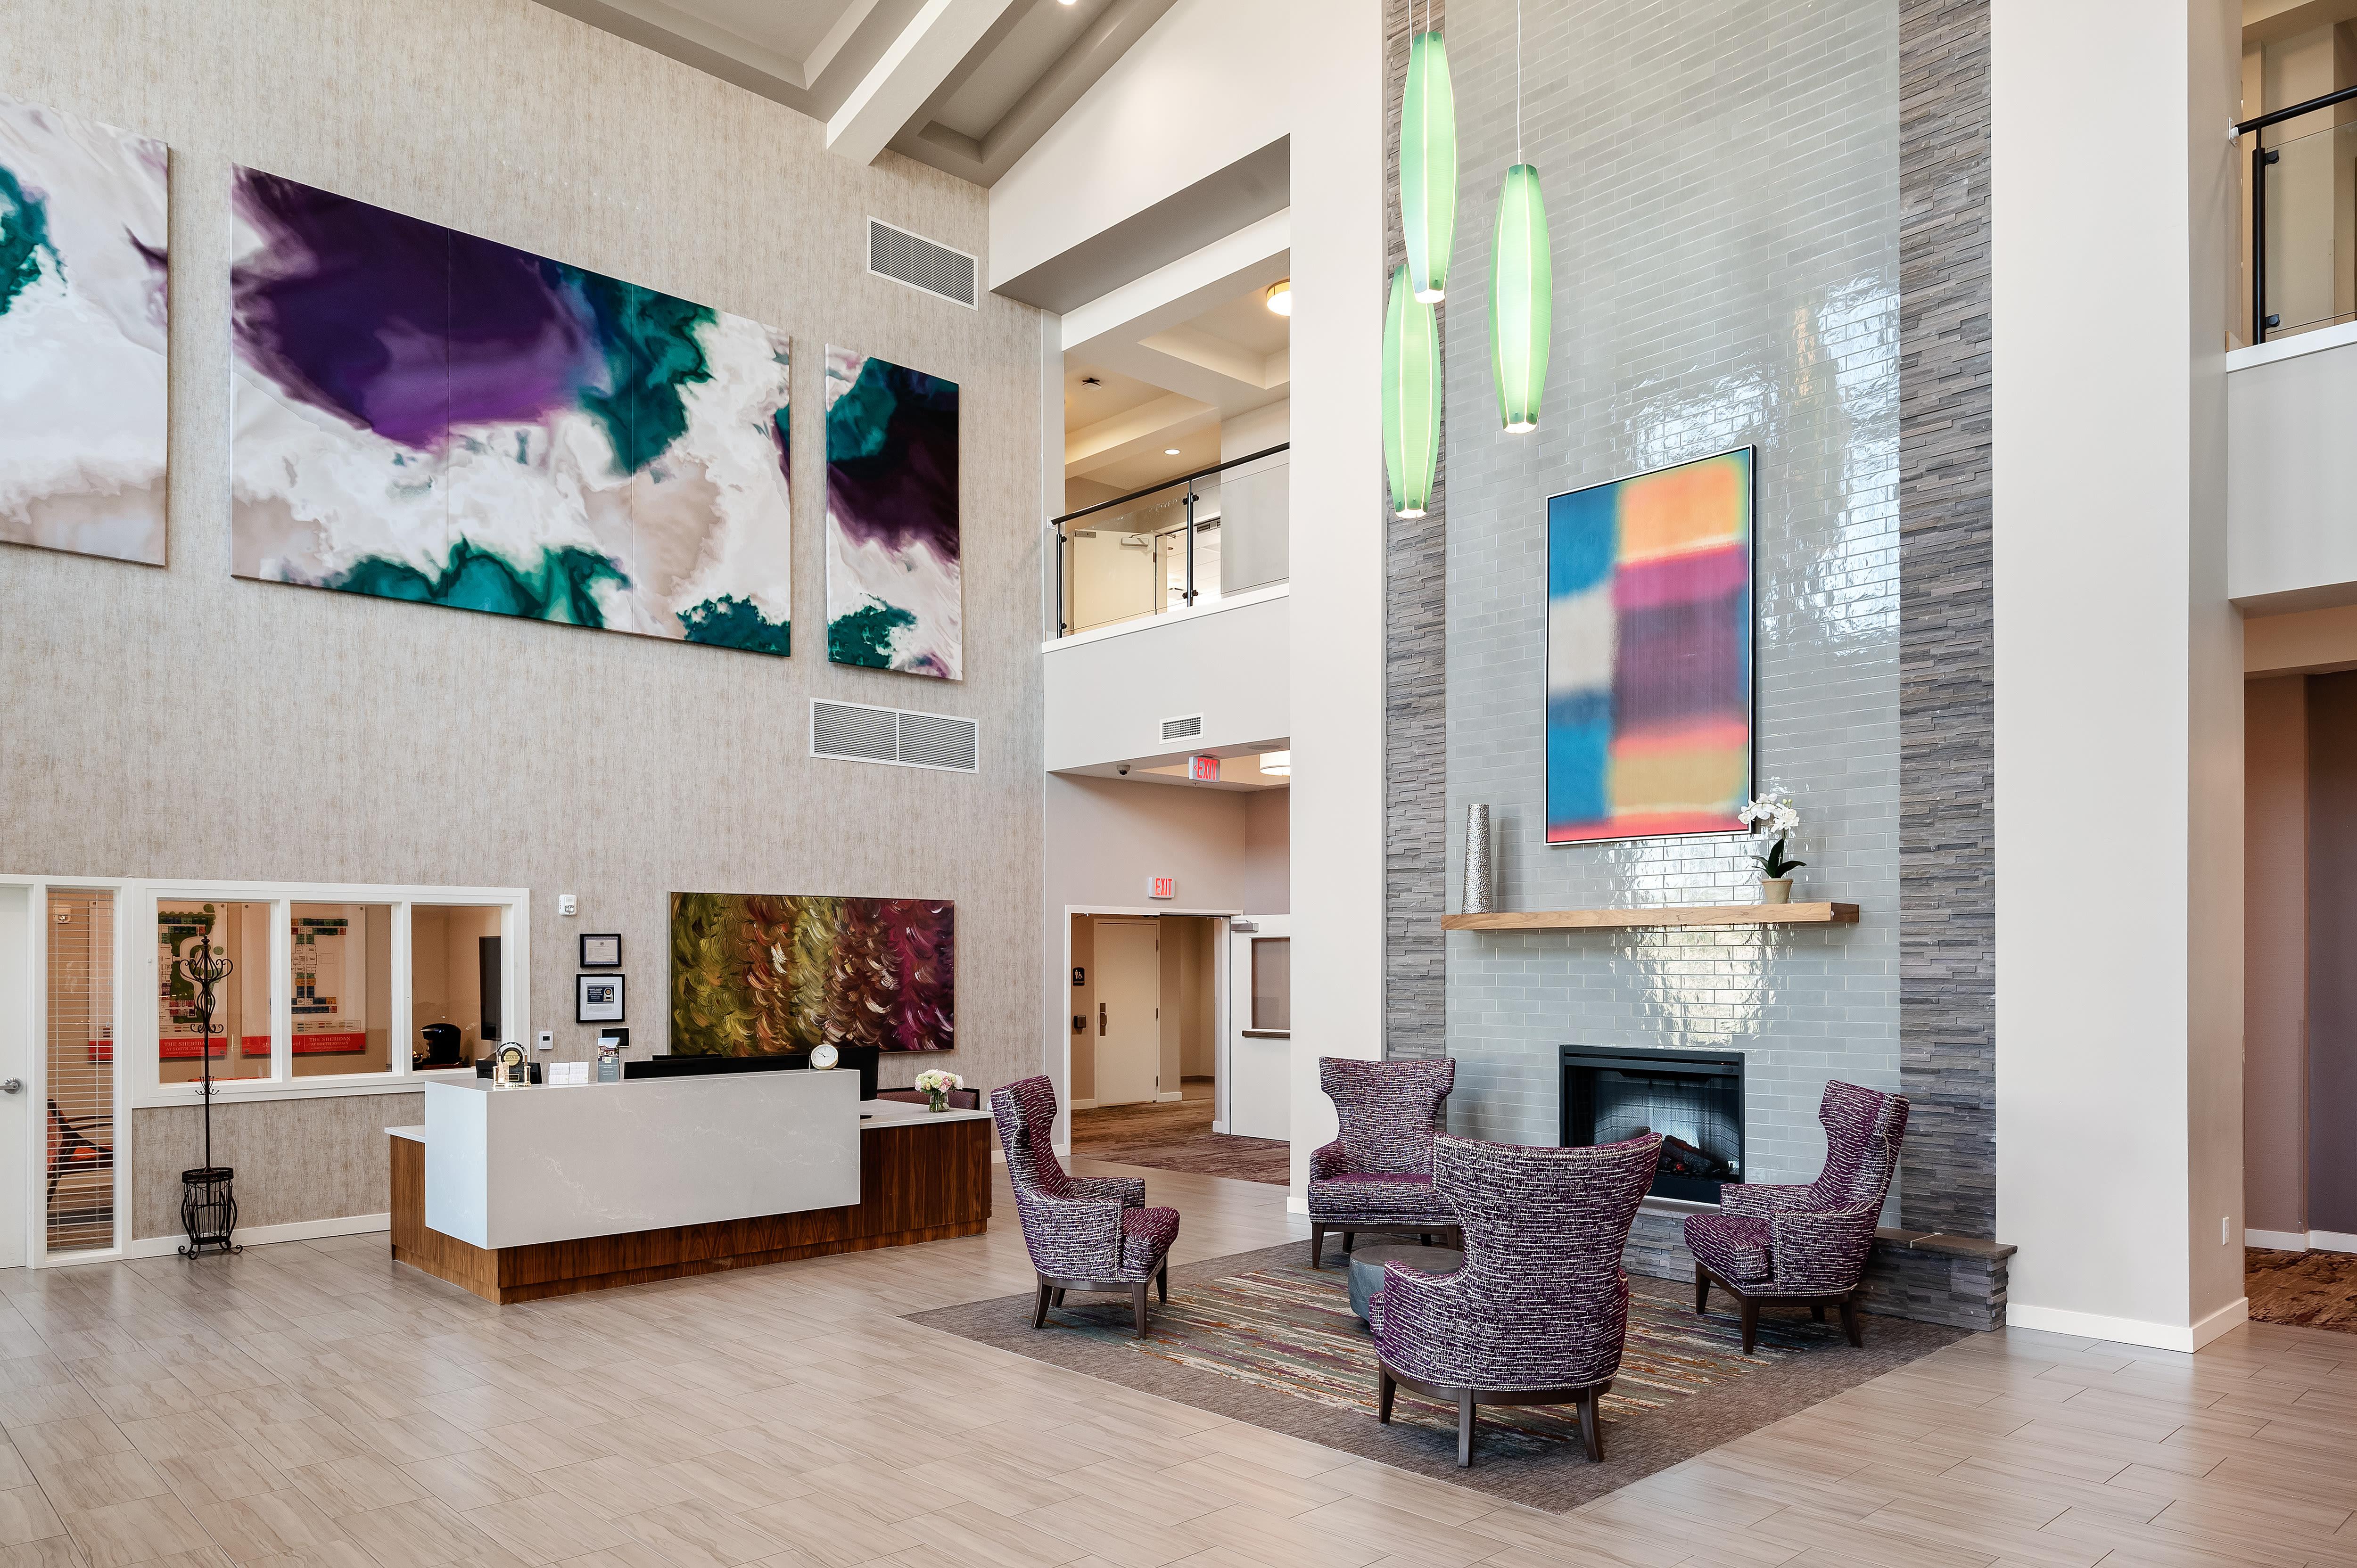 A large lobby at Anthology of South Jordan in South Jordan, Utah